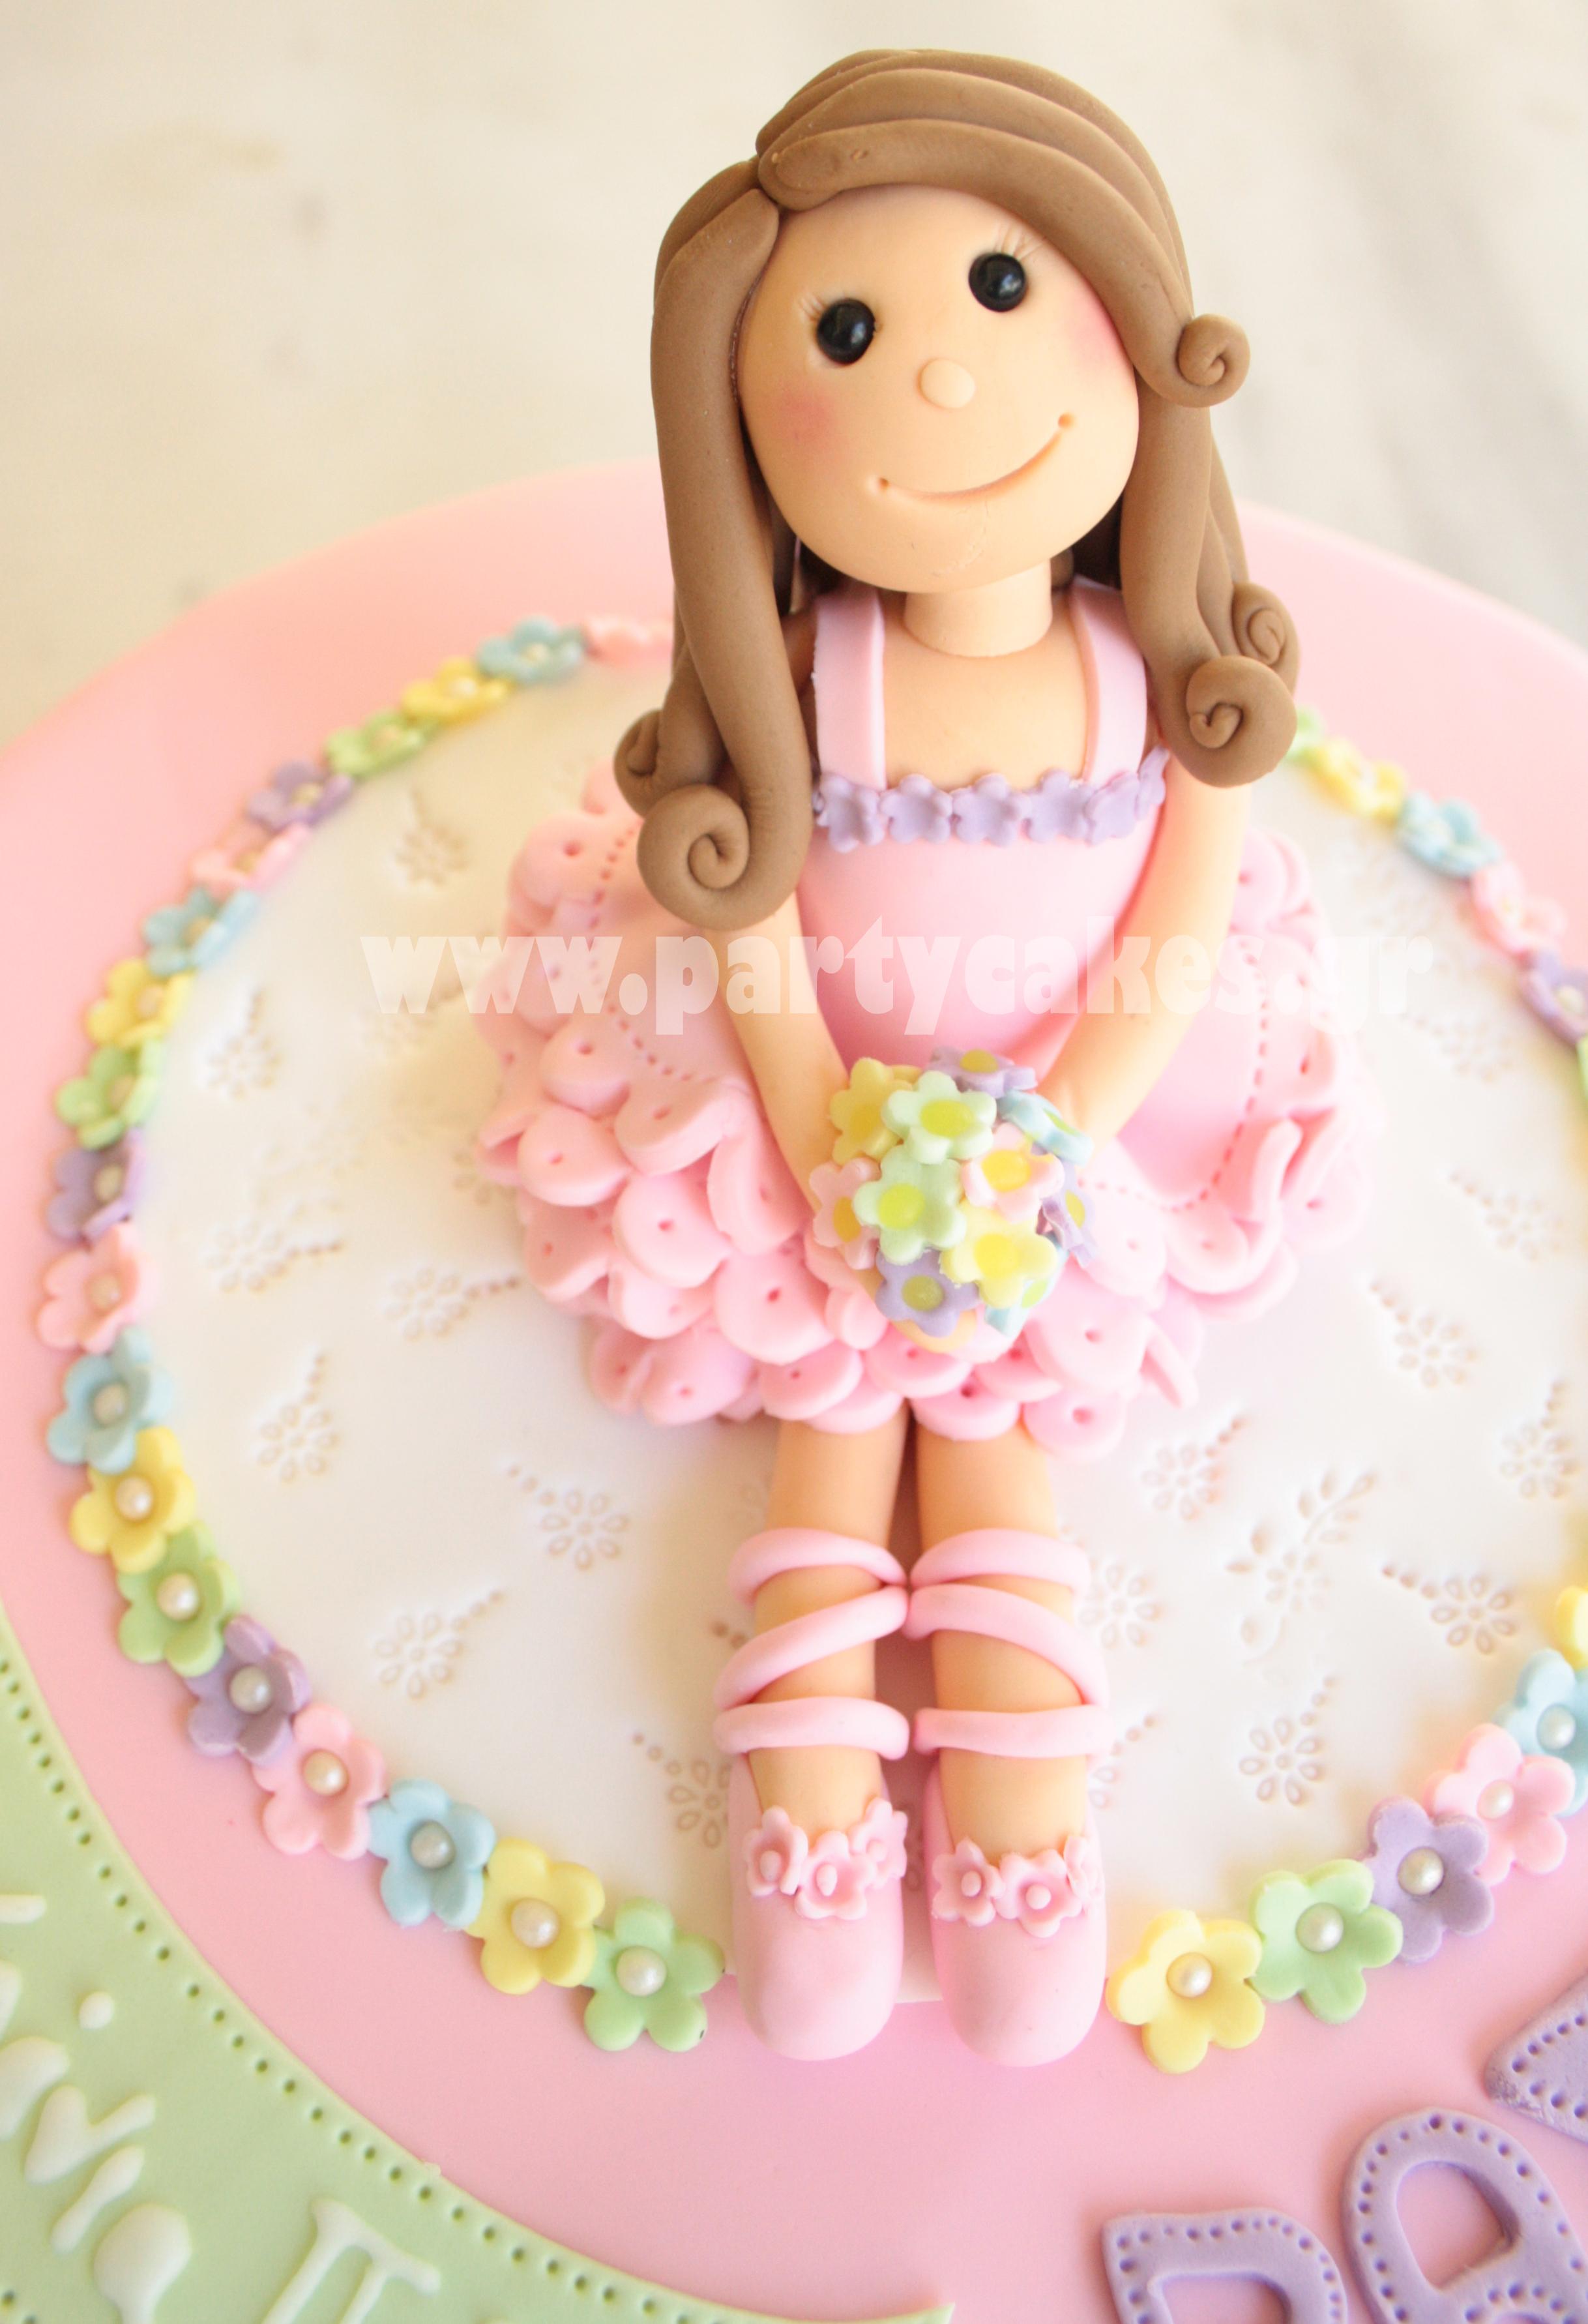 Ballet+cake+2b+copy.jpg